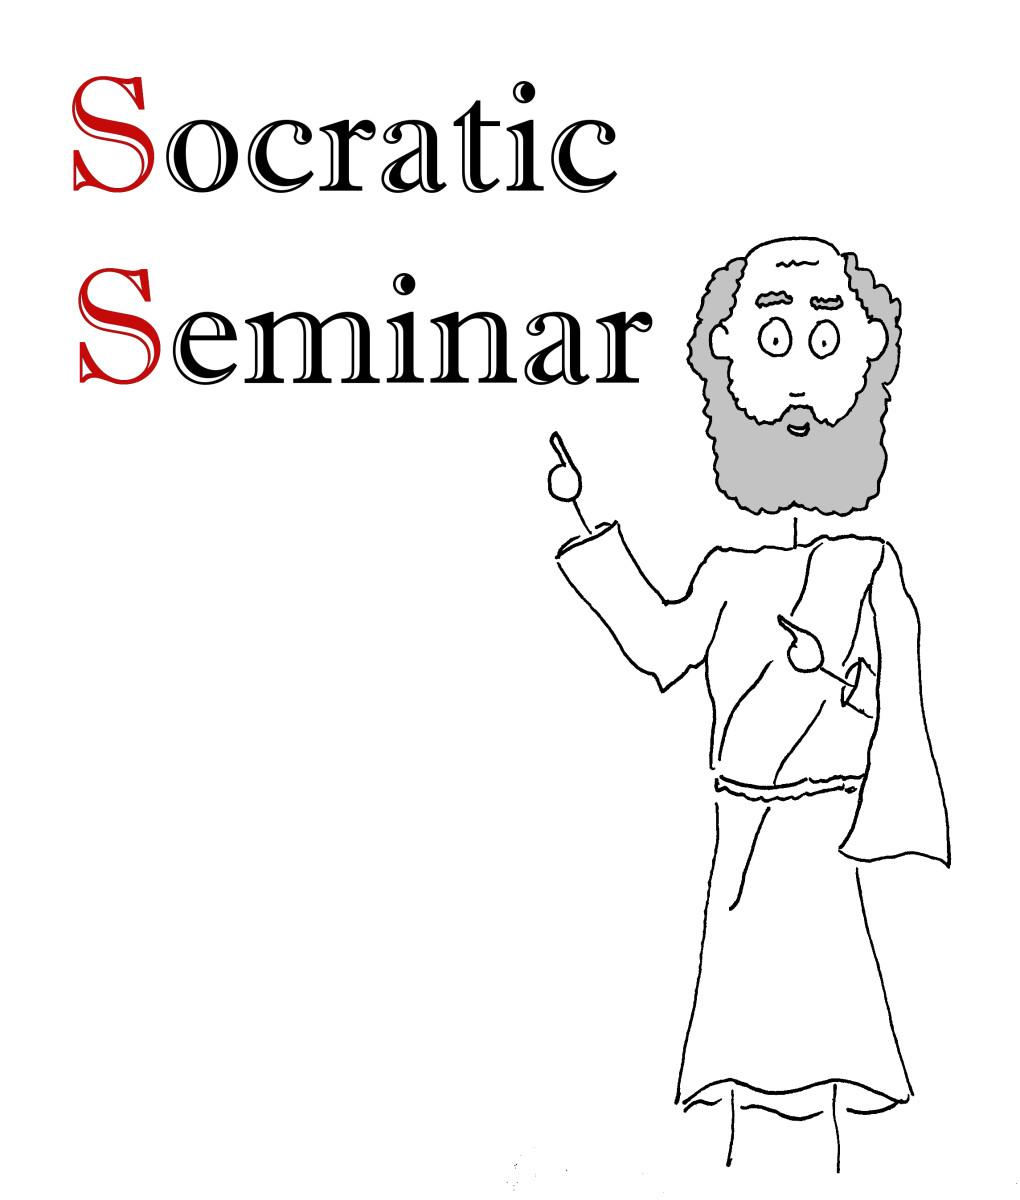 Socratic Seminar Guidelines: A Practical Guide